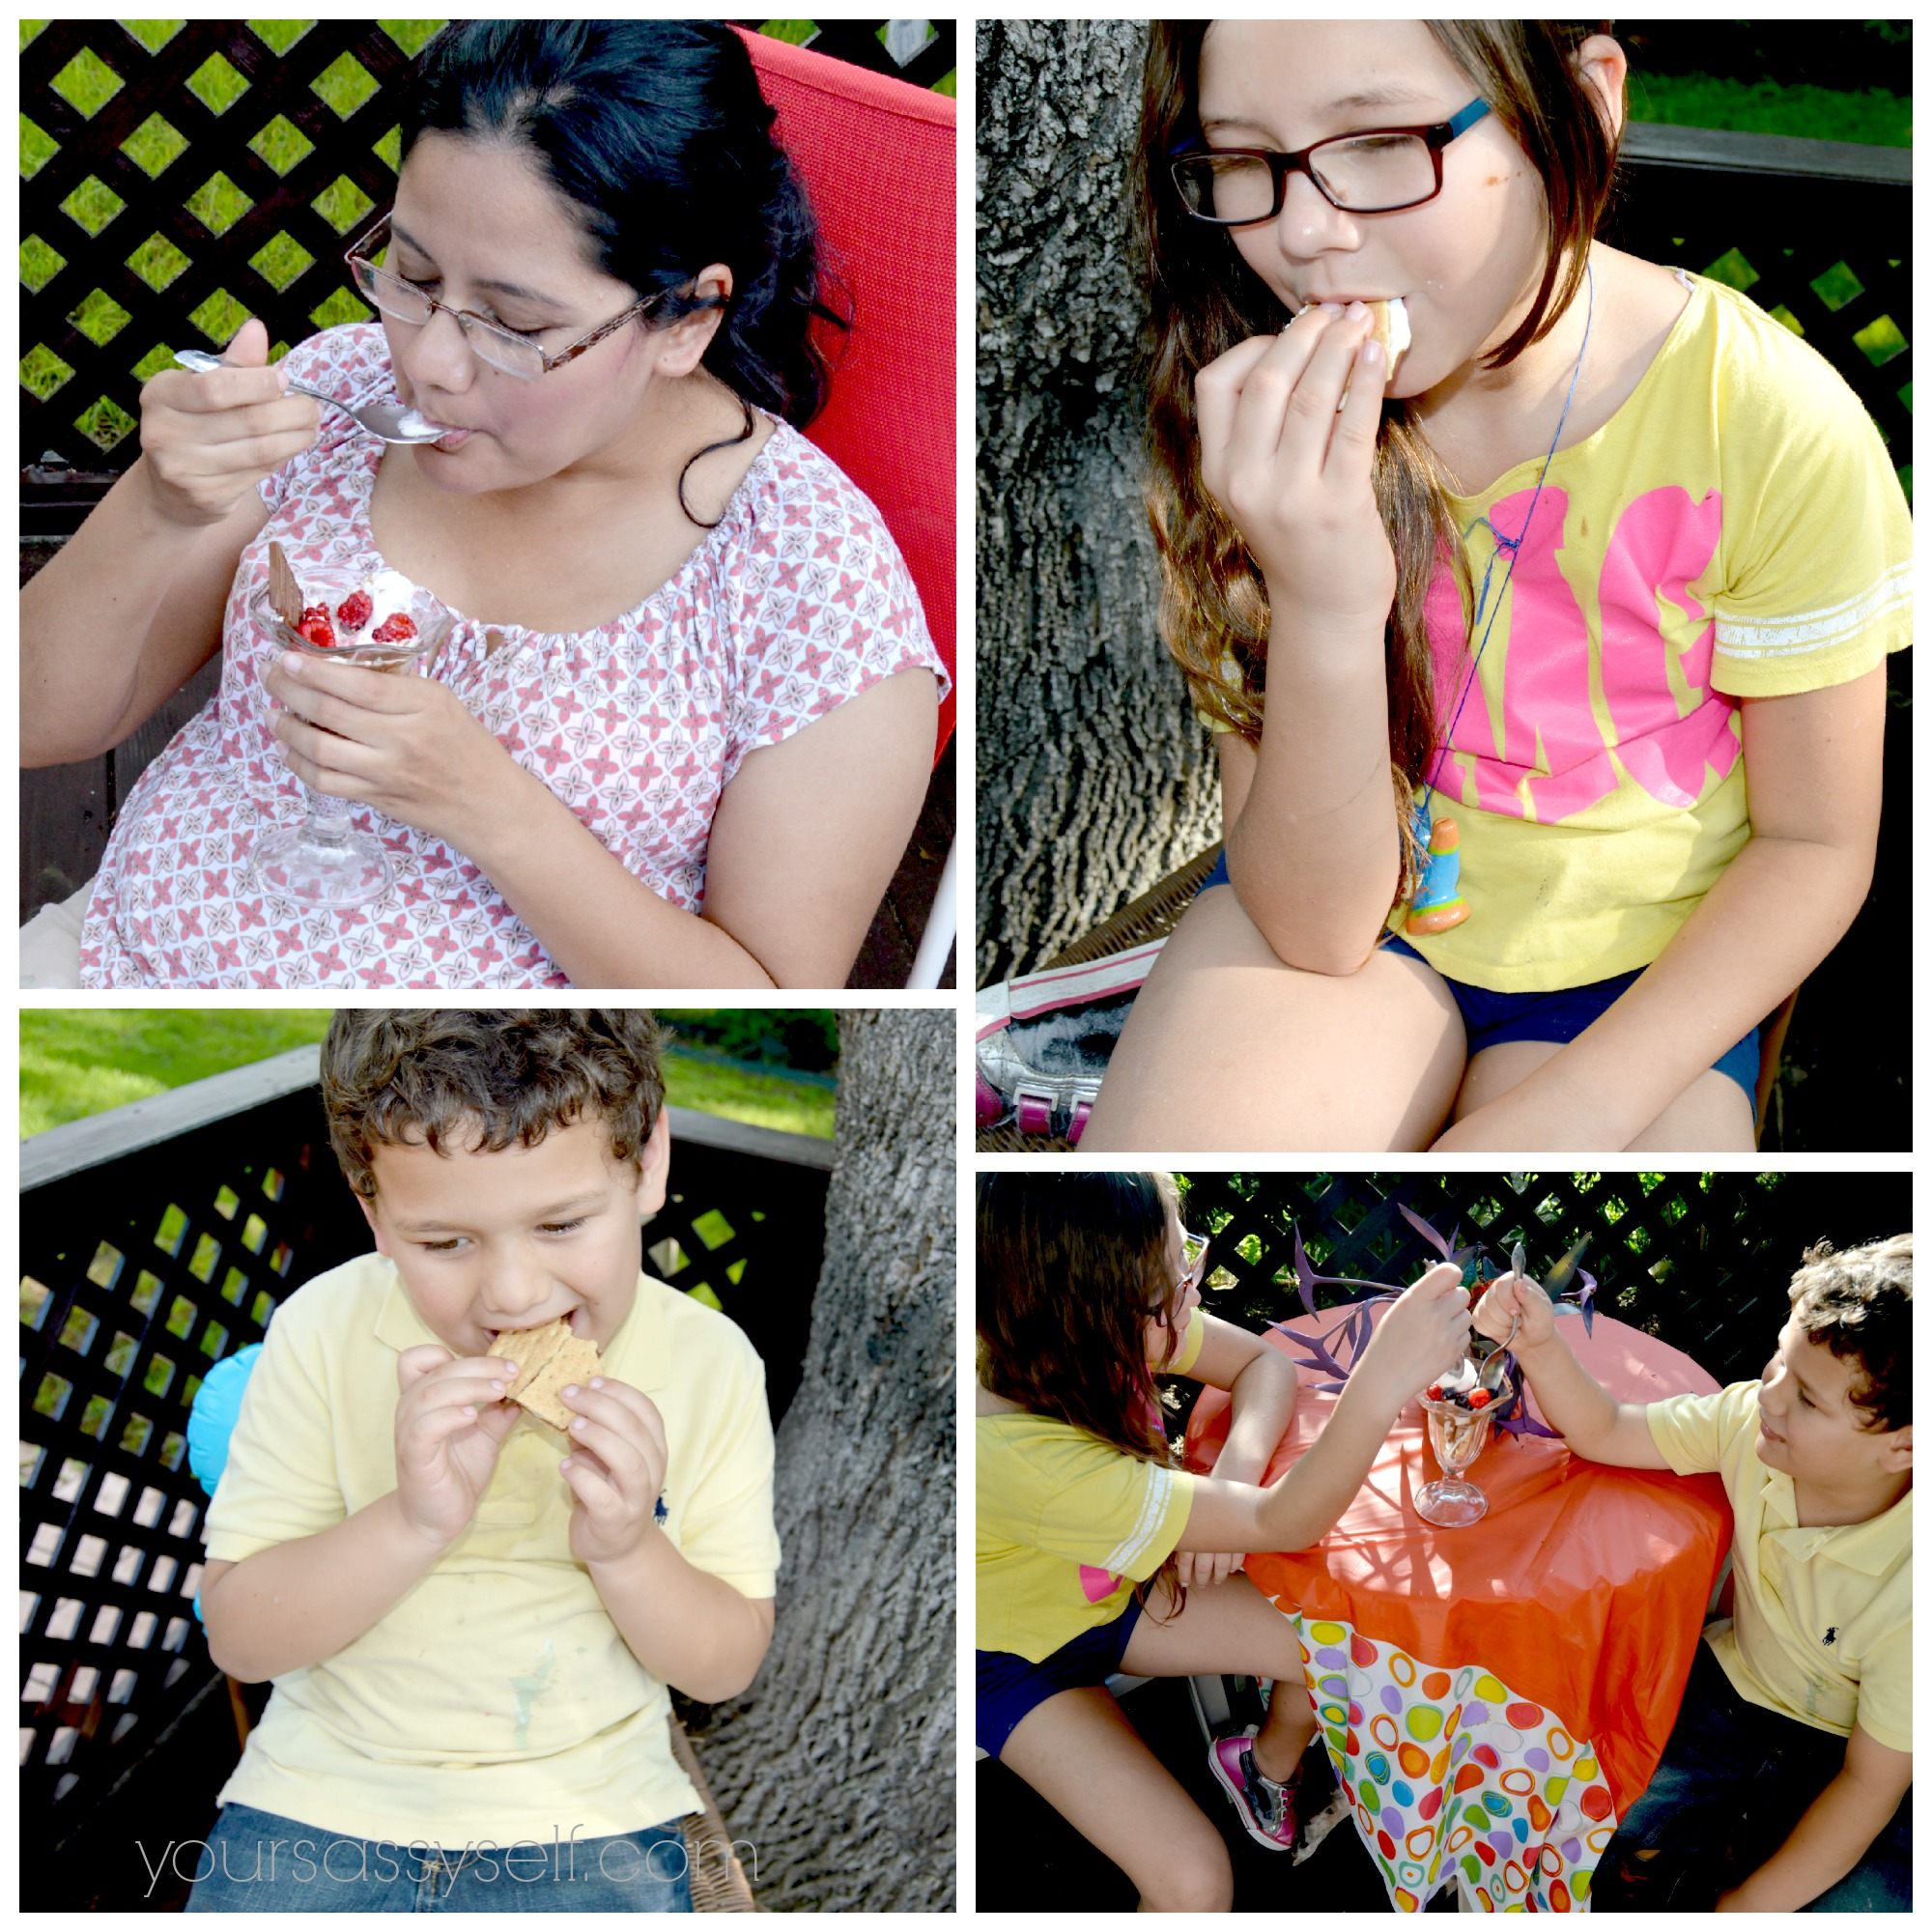 Family Enjoying Berrylicious Smores - yoursassyself.com